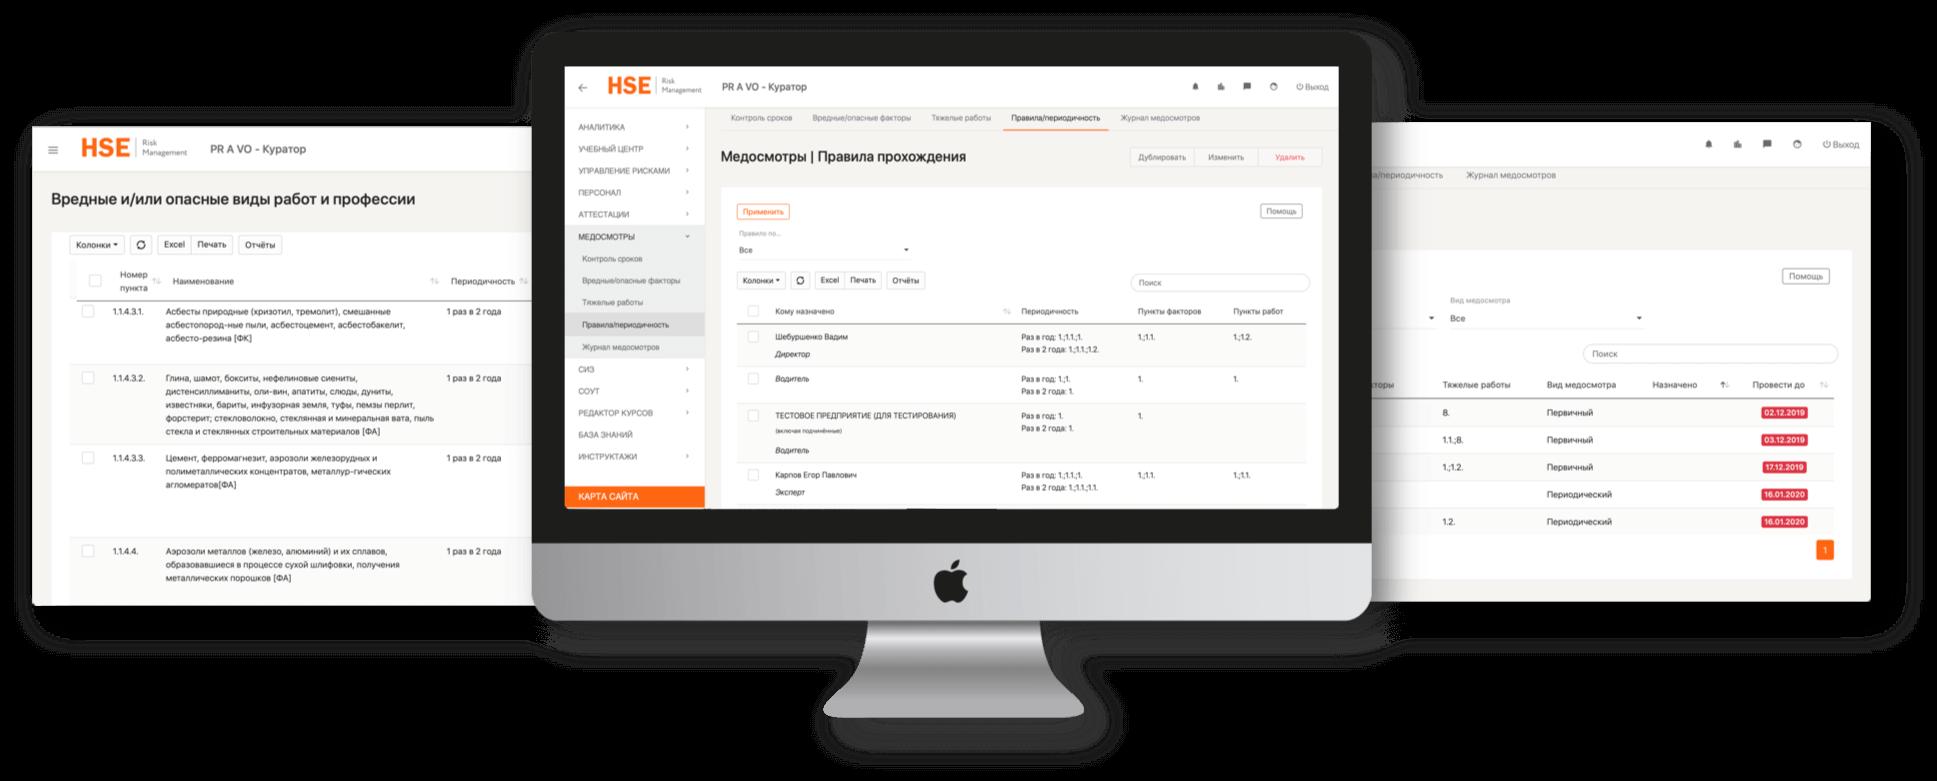 HSE Health Care, скриншот системы 1